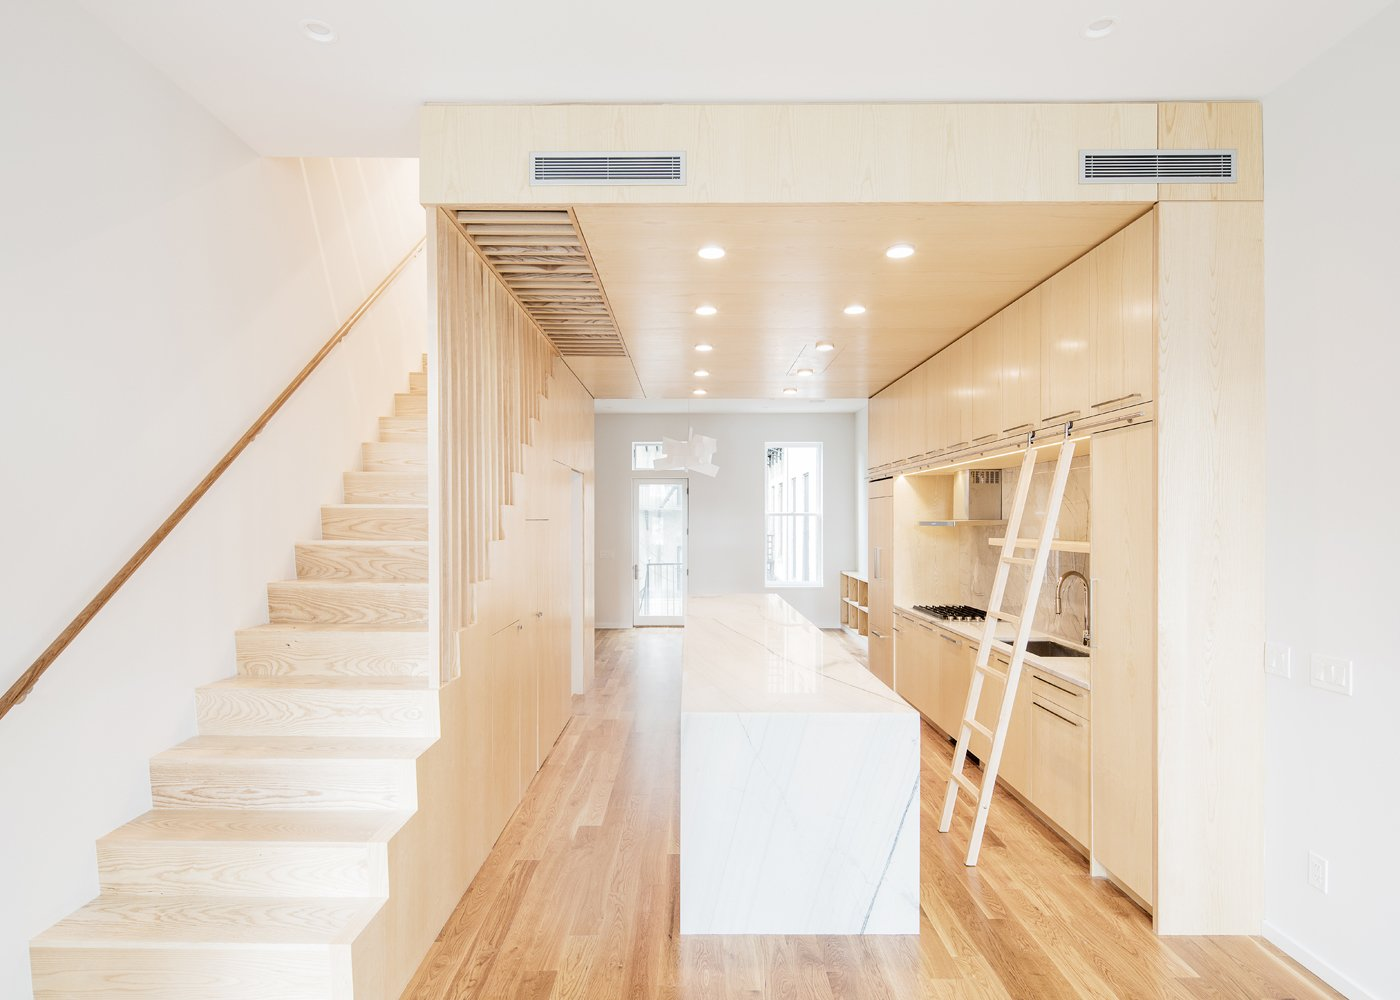 Kitchen, Marble Counter, Wood Cabinet, Medium Hardwood Floor, Marble Backsplashe, and Recessed Lighting  Wayne Street Row House